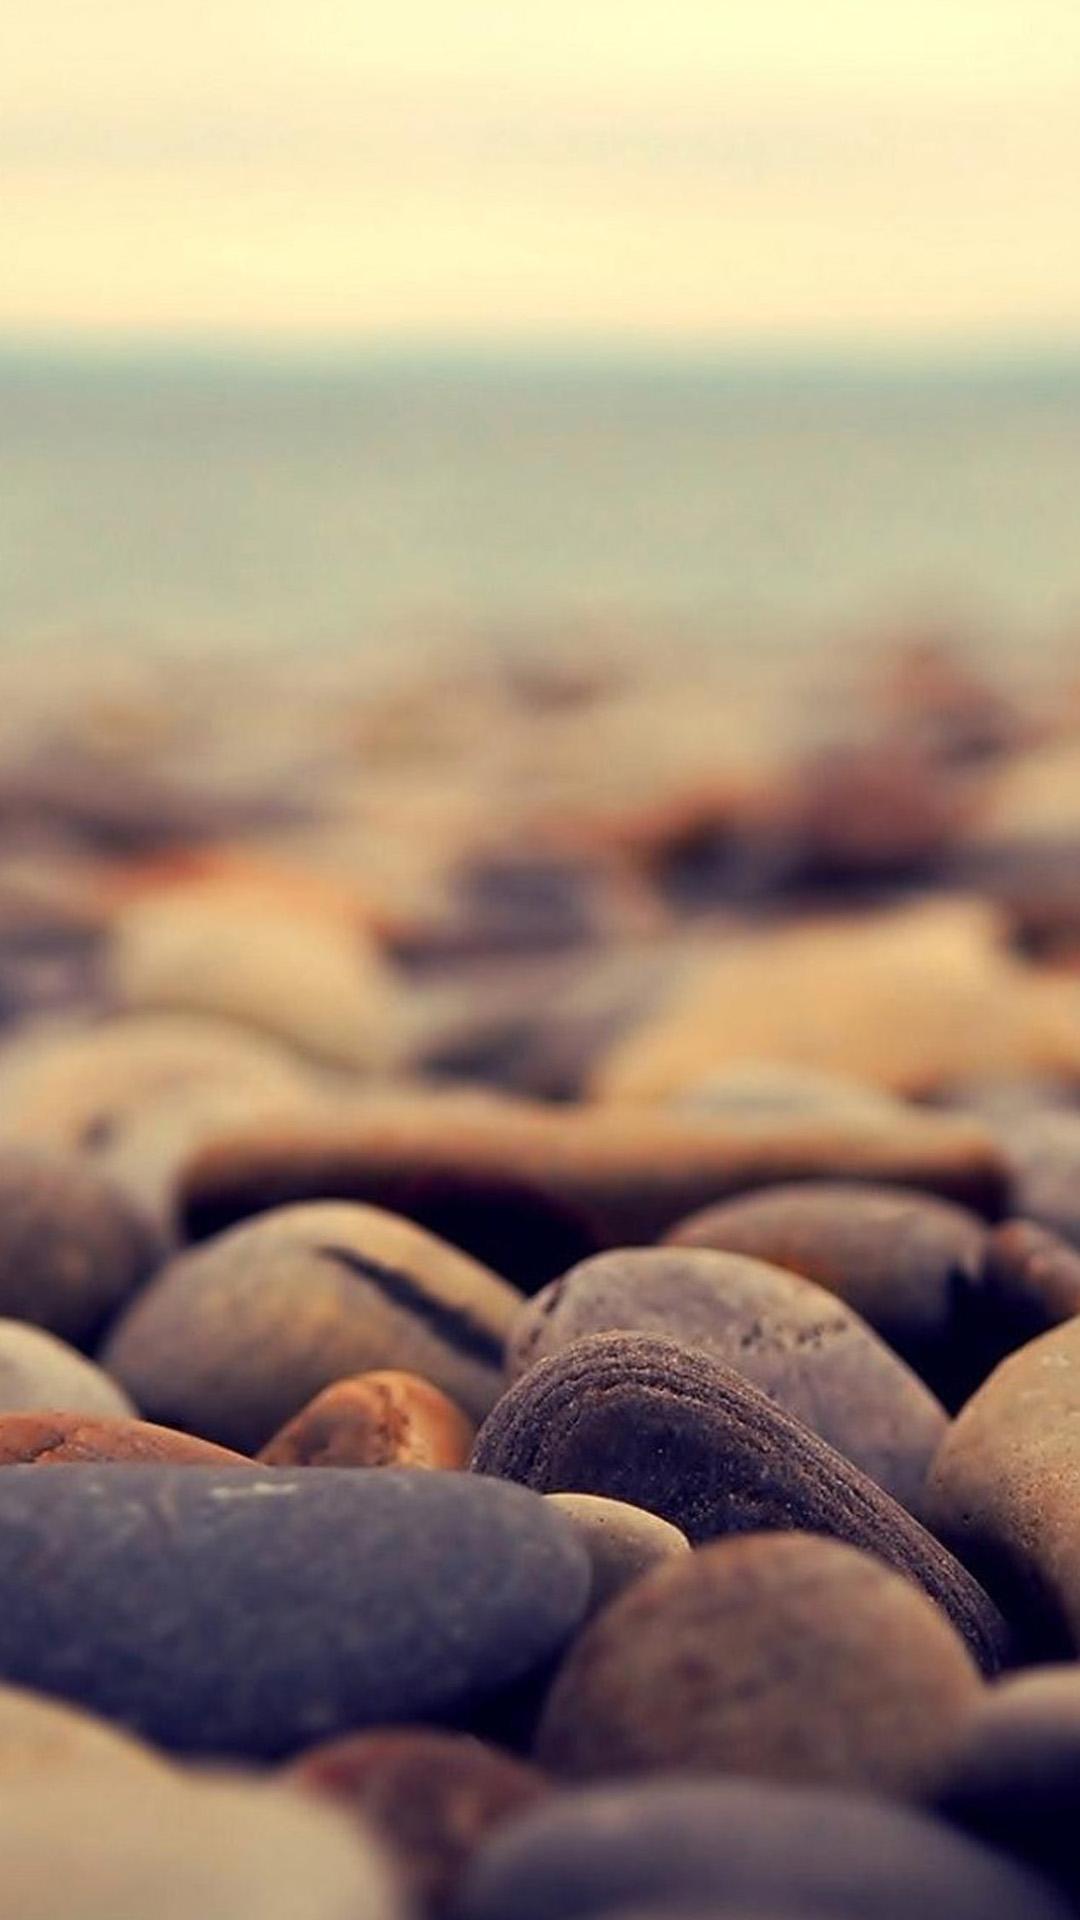 Ocean-Rocks-Wallpaper-iPhone-6-Plus.jpg